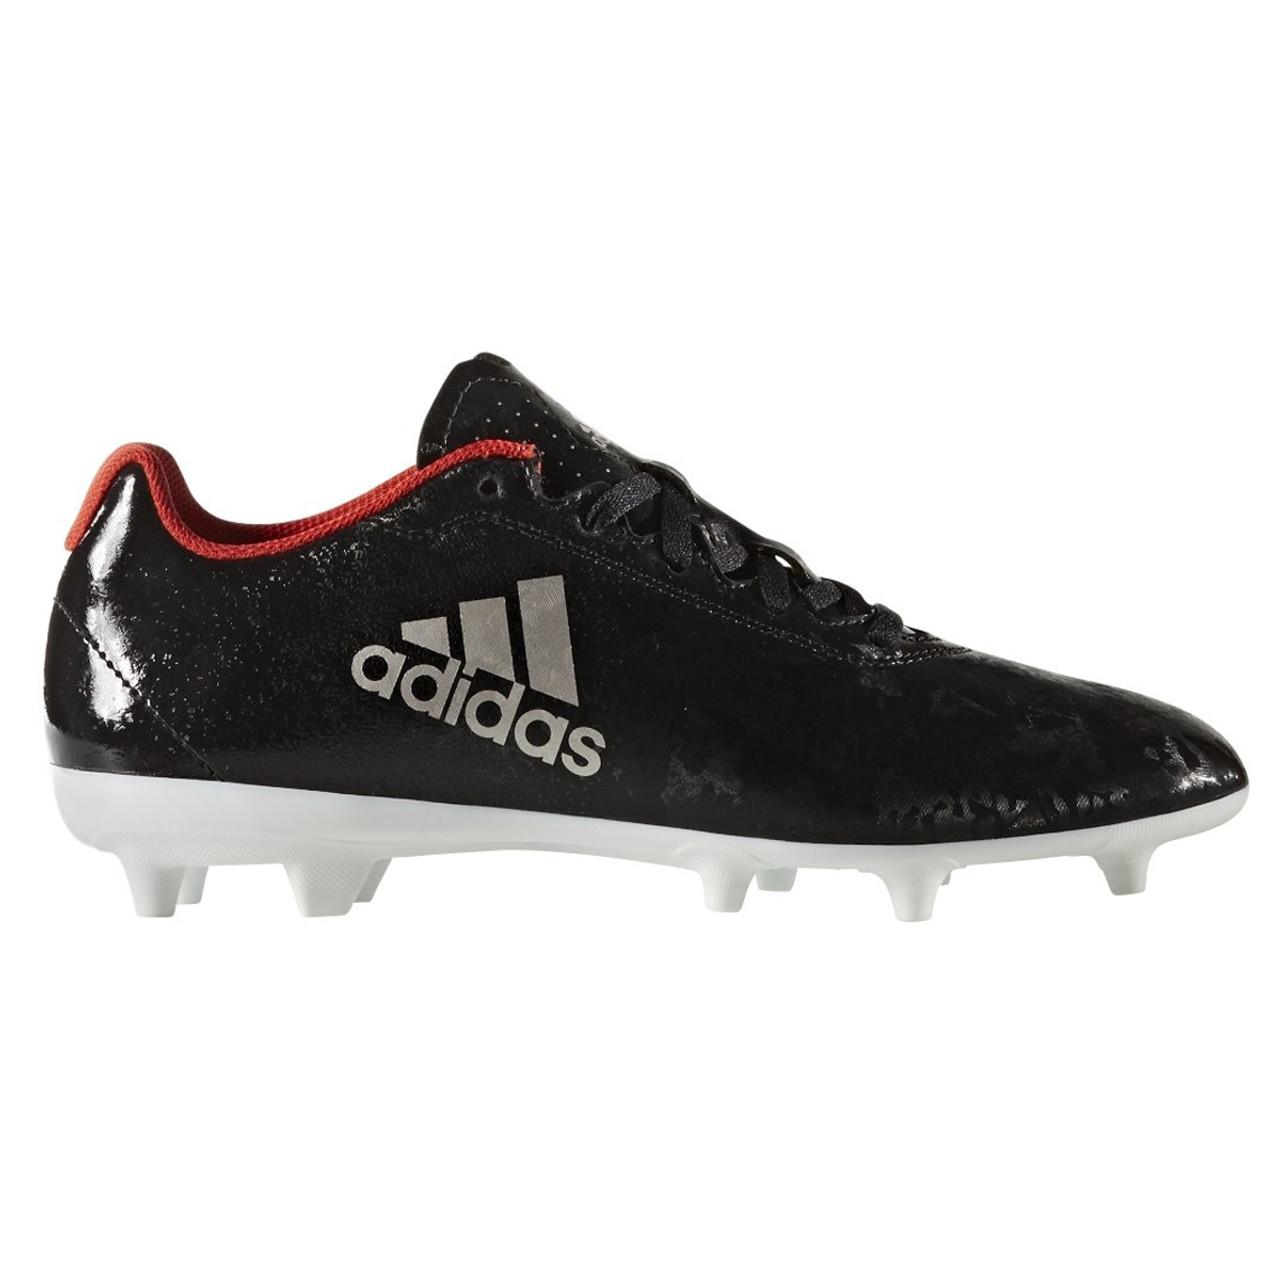 Adidas X 17.4 FG Women s Soccer Cleats BA8564 - Black ac9172f490